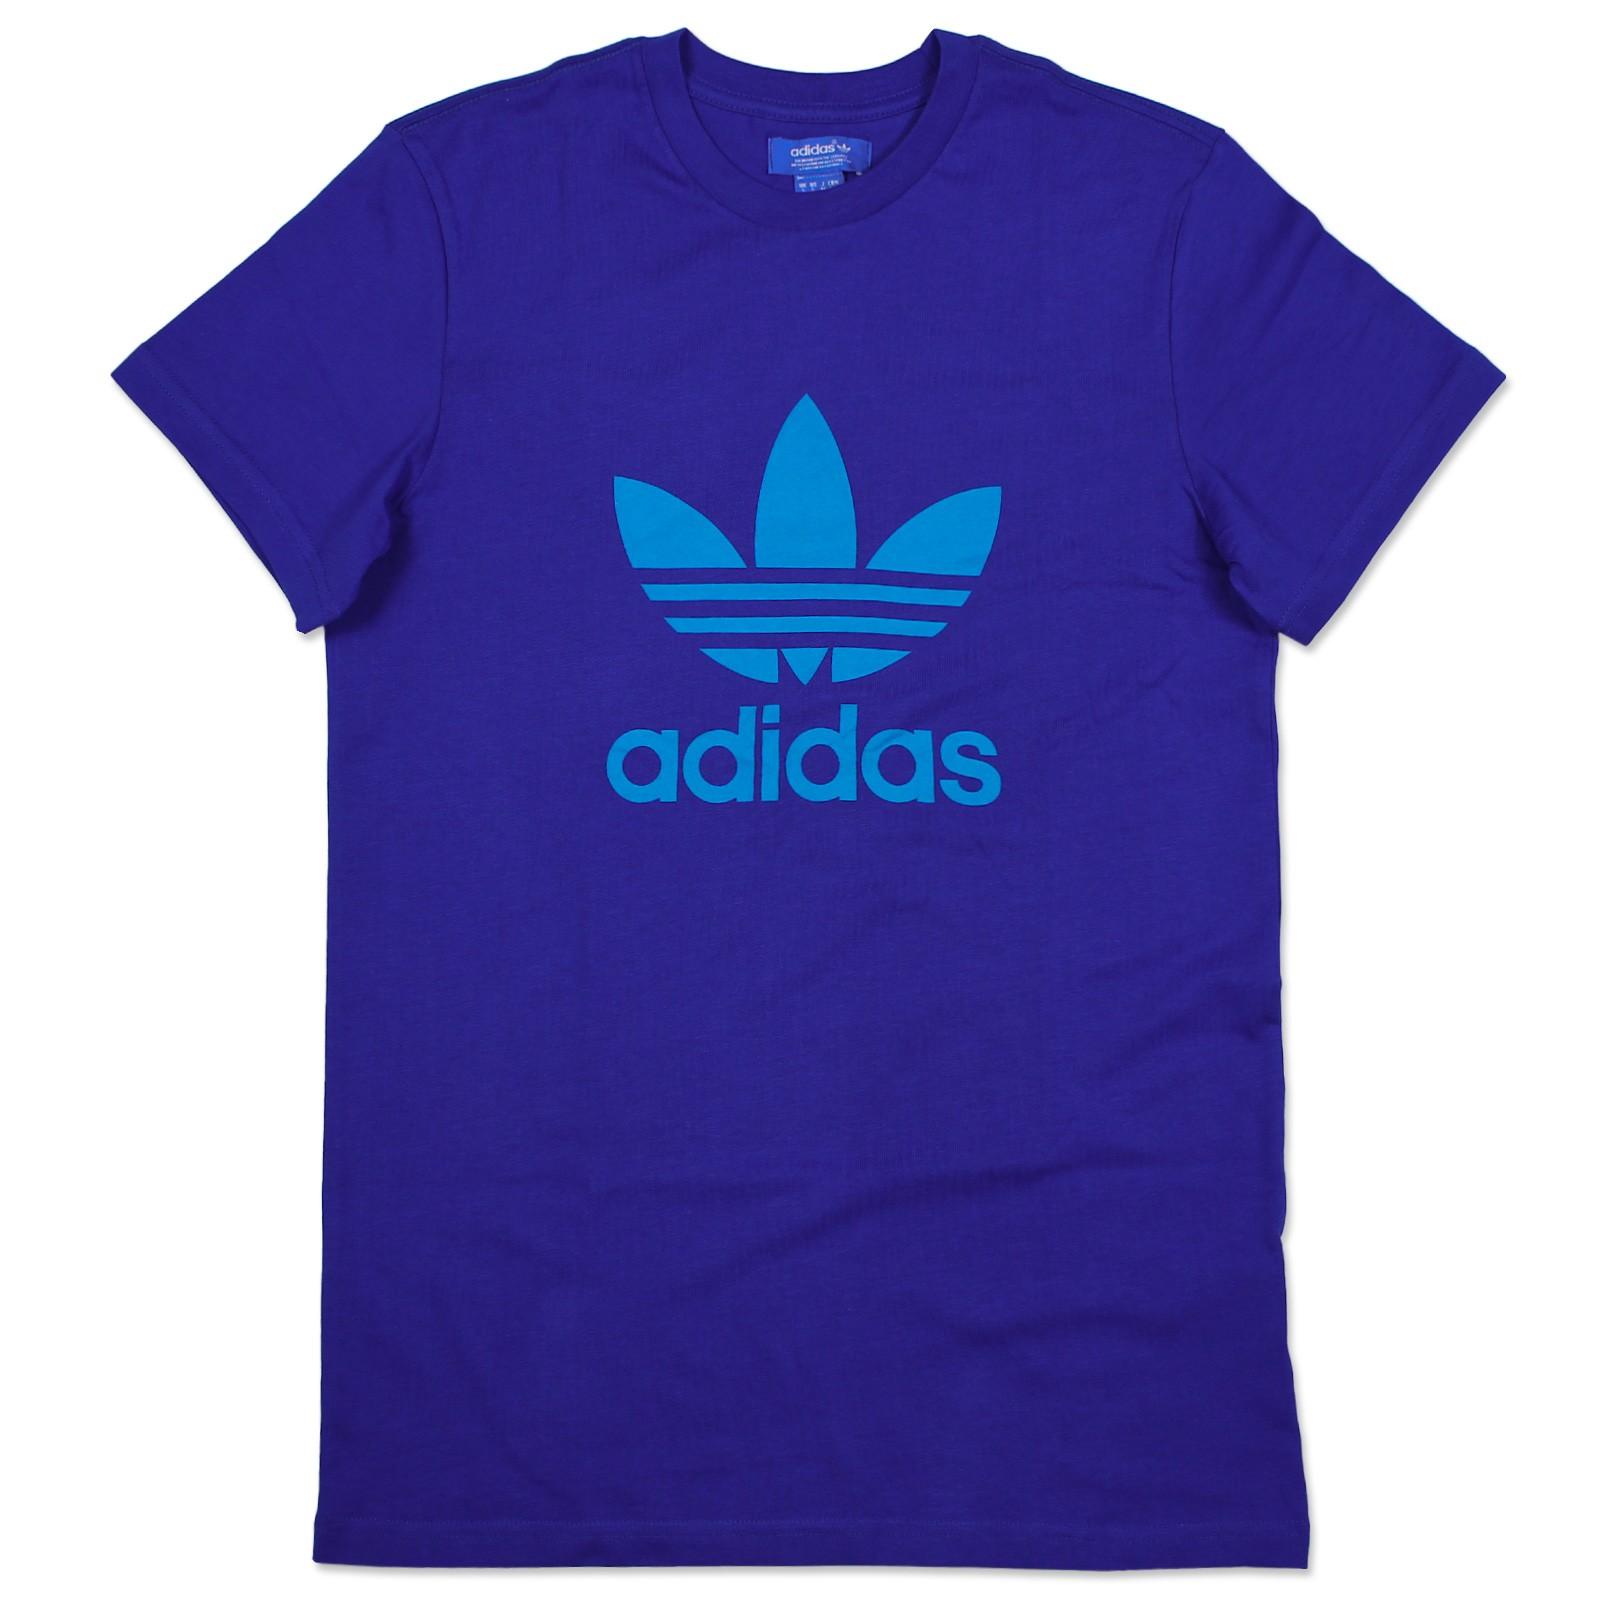 Adidas Originals Adi Trefoil Tee Herren Freizeit Kult T